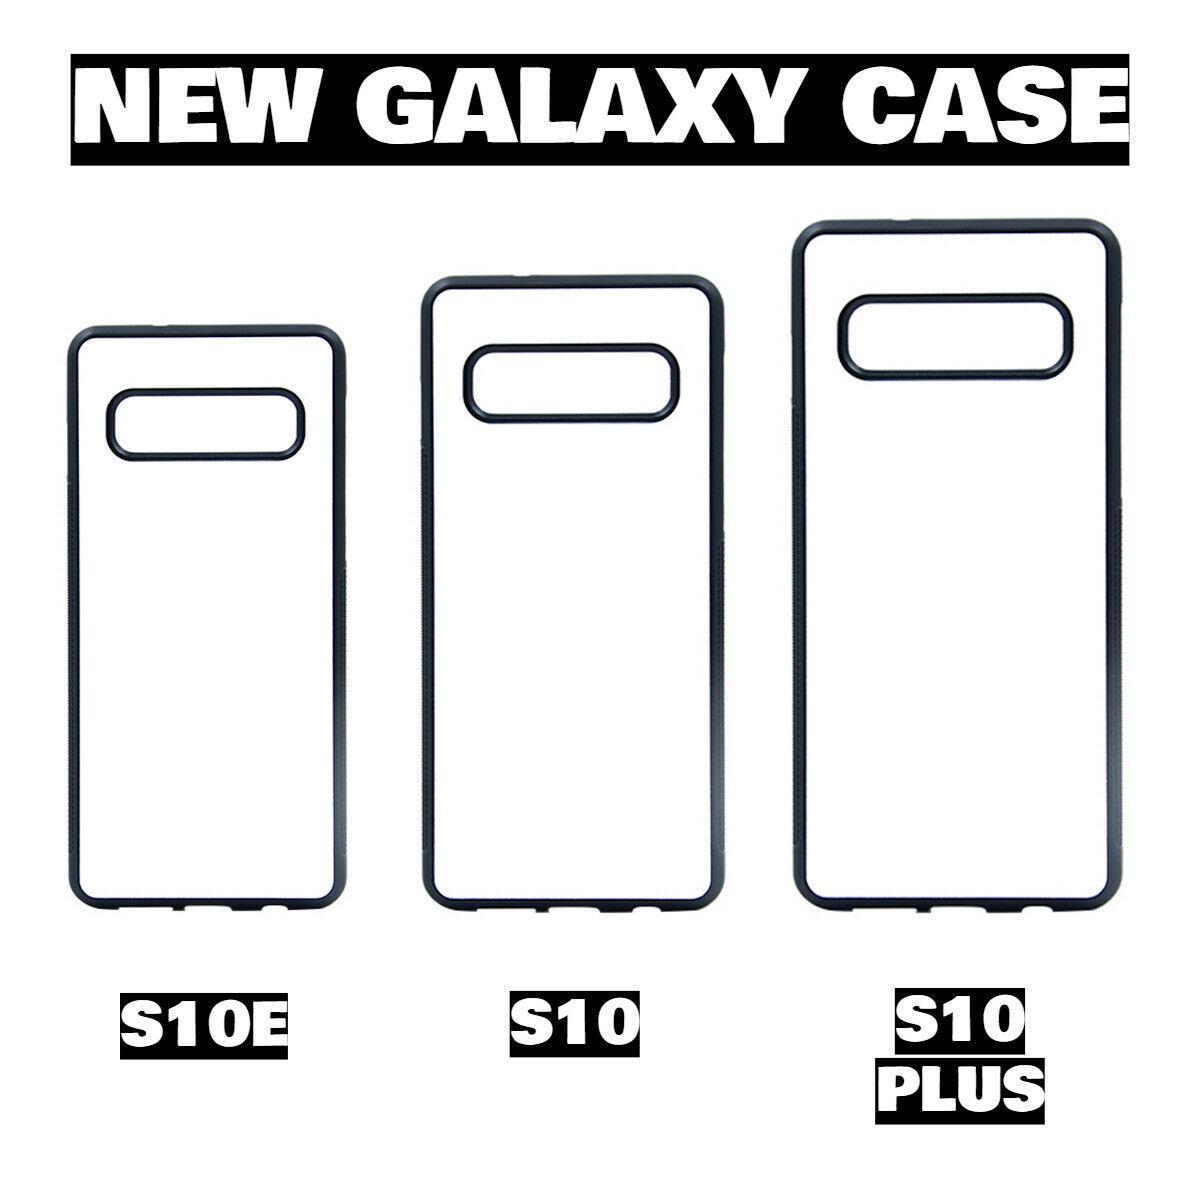 boise state broncos Galaxy s10 S10e S10 plus s9 s7 s7 edge s8 s8 plus case